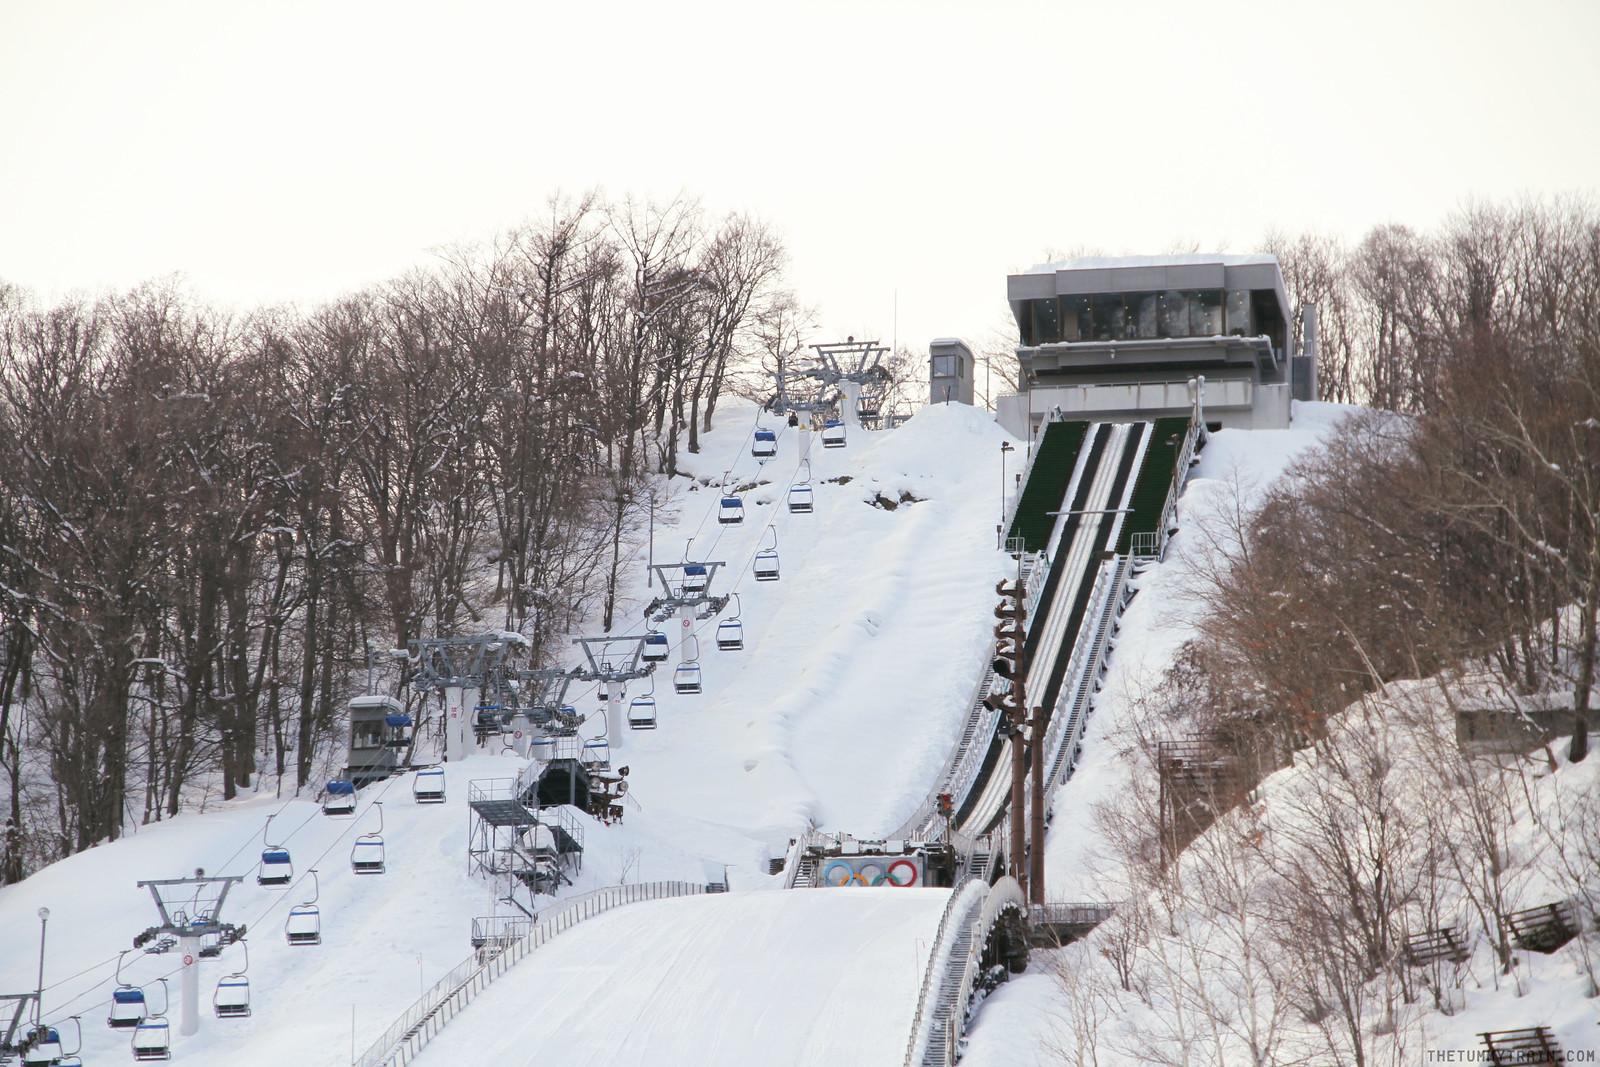 32792842791 942b503812 h - Sapporo Snow And Smile: 8 Unforgettable Winter Experiences in Sapporo City